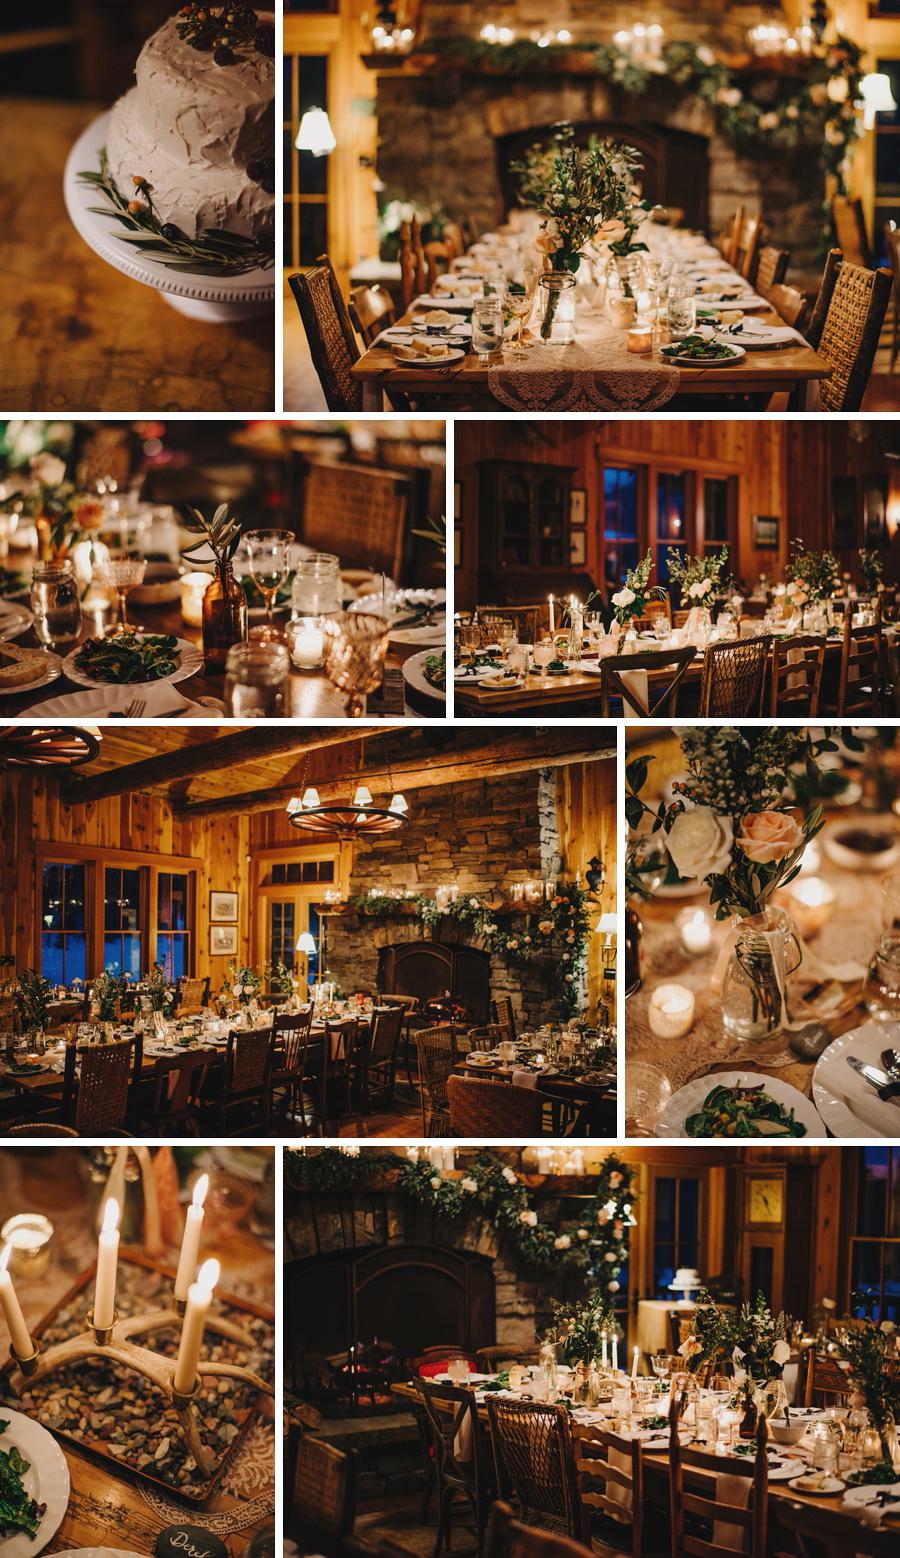 montana wedding photographer, montana photography, whitefish photographer, wedding, ranch wedding, moments in mountains, chasing light, nikon d750, vsco, © Gabe Mcclintock Photography | www.gabemcclintock.com